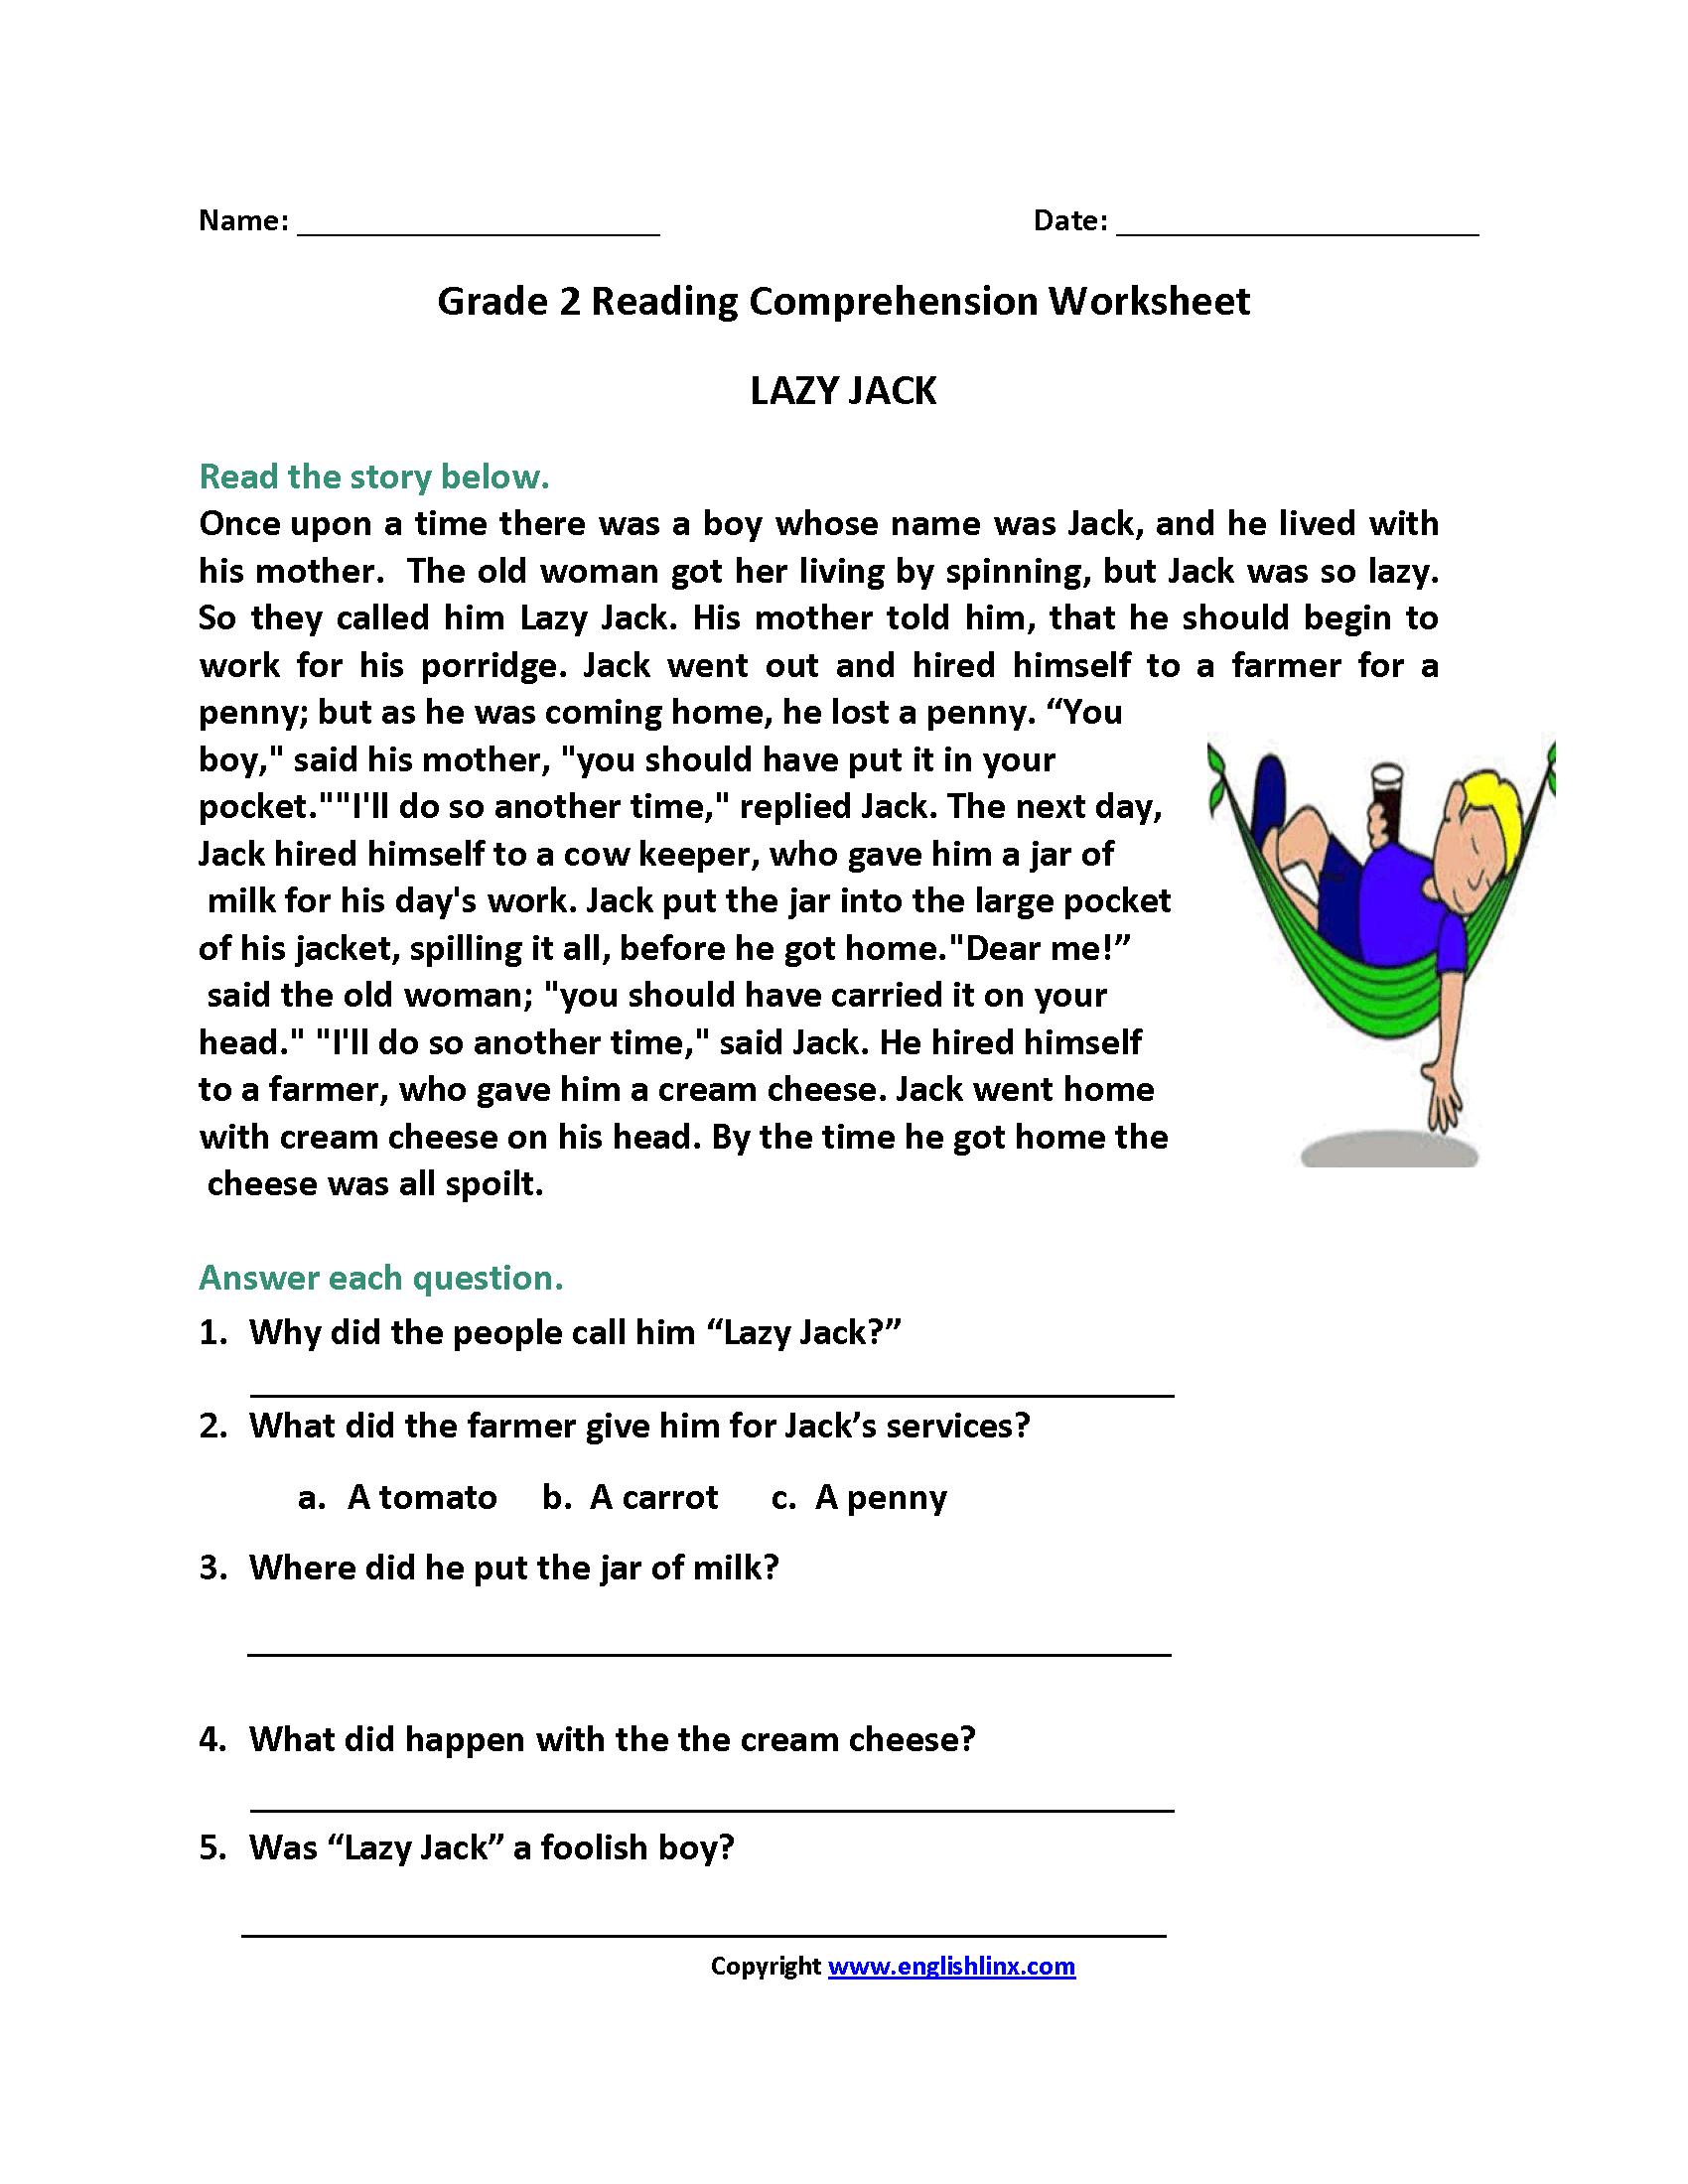 Reading Worksheets | Second Grade Reading Worksheets | Second Grade Reading Comprehension Printable Worksheets